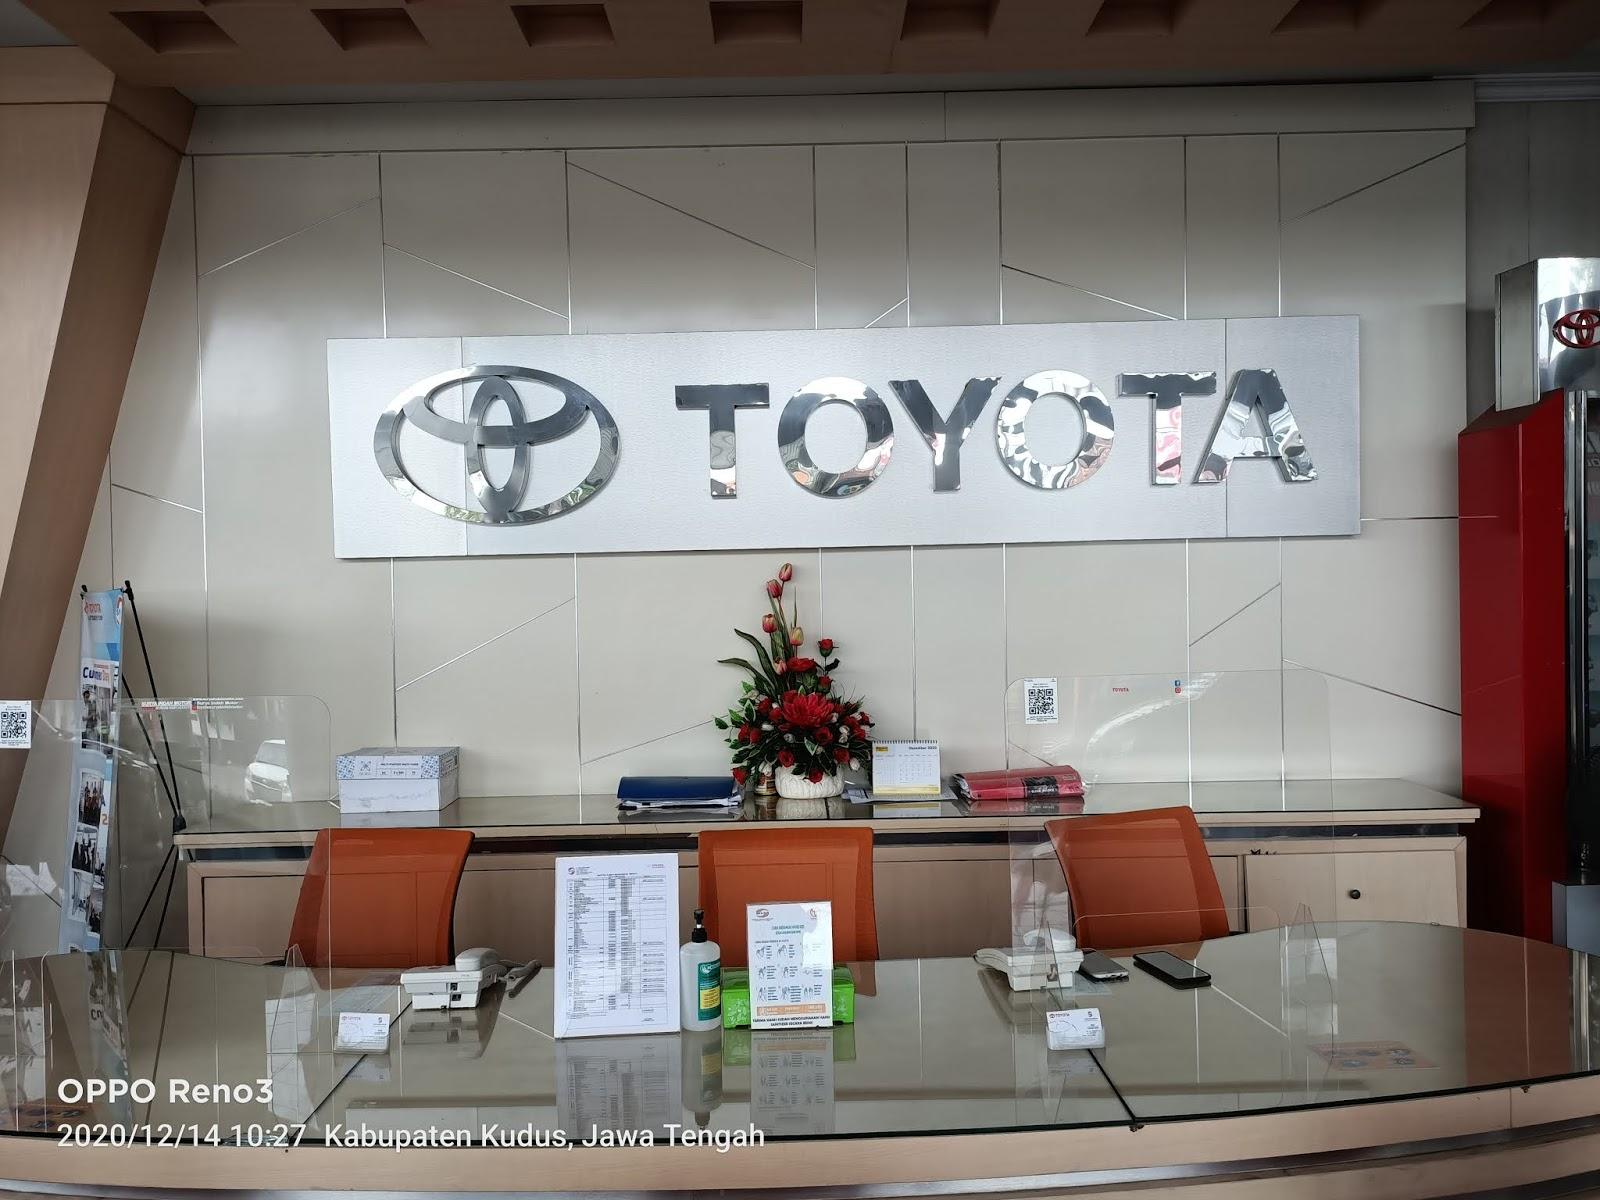 #toyotakudus #sales #servis #sparepart #bodyreapair #nandhatoyotakudus